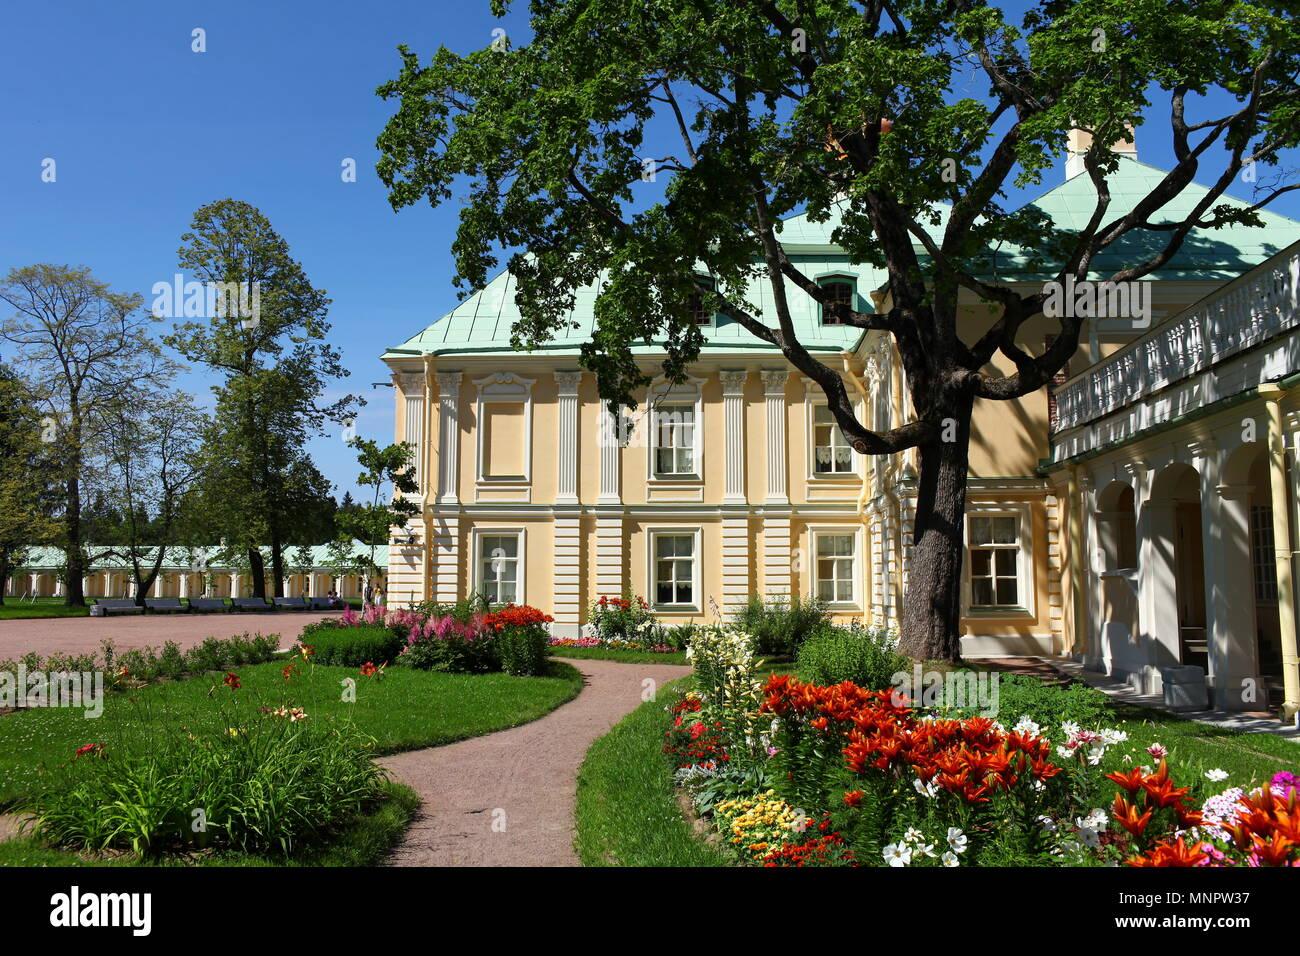 House Russia Oranienbaum Stockfotos & House Russia Oranienbaum ...